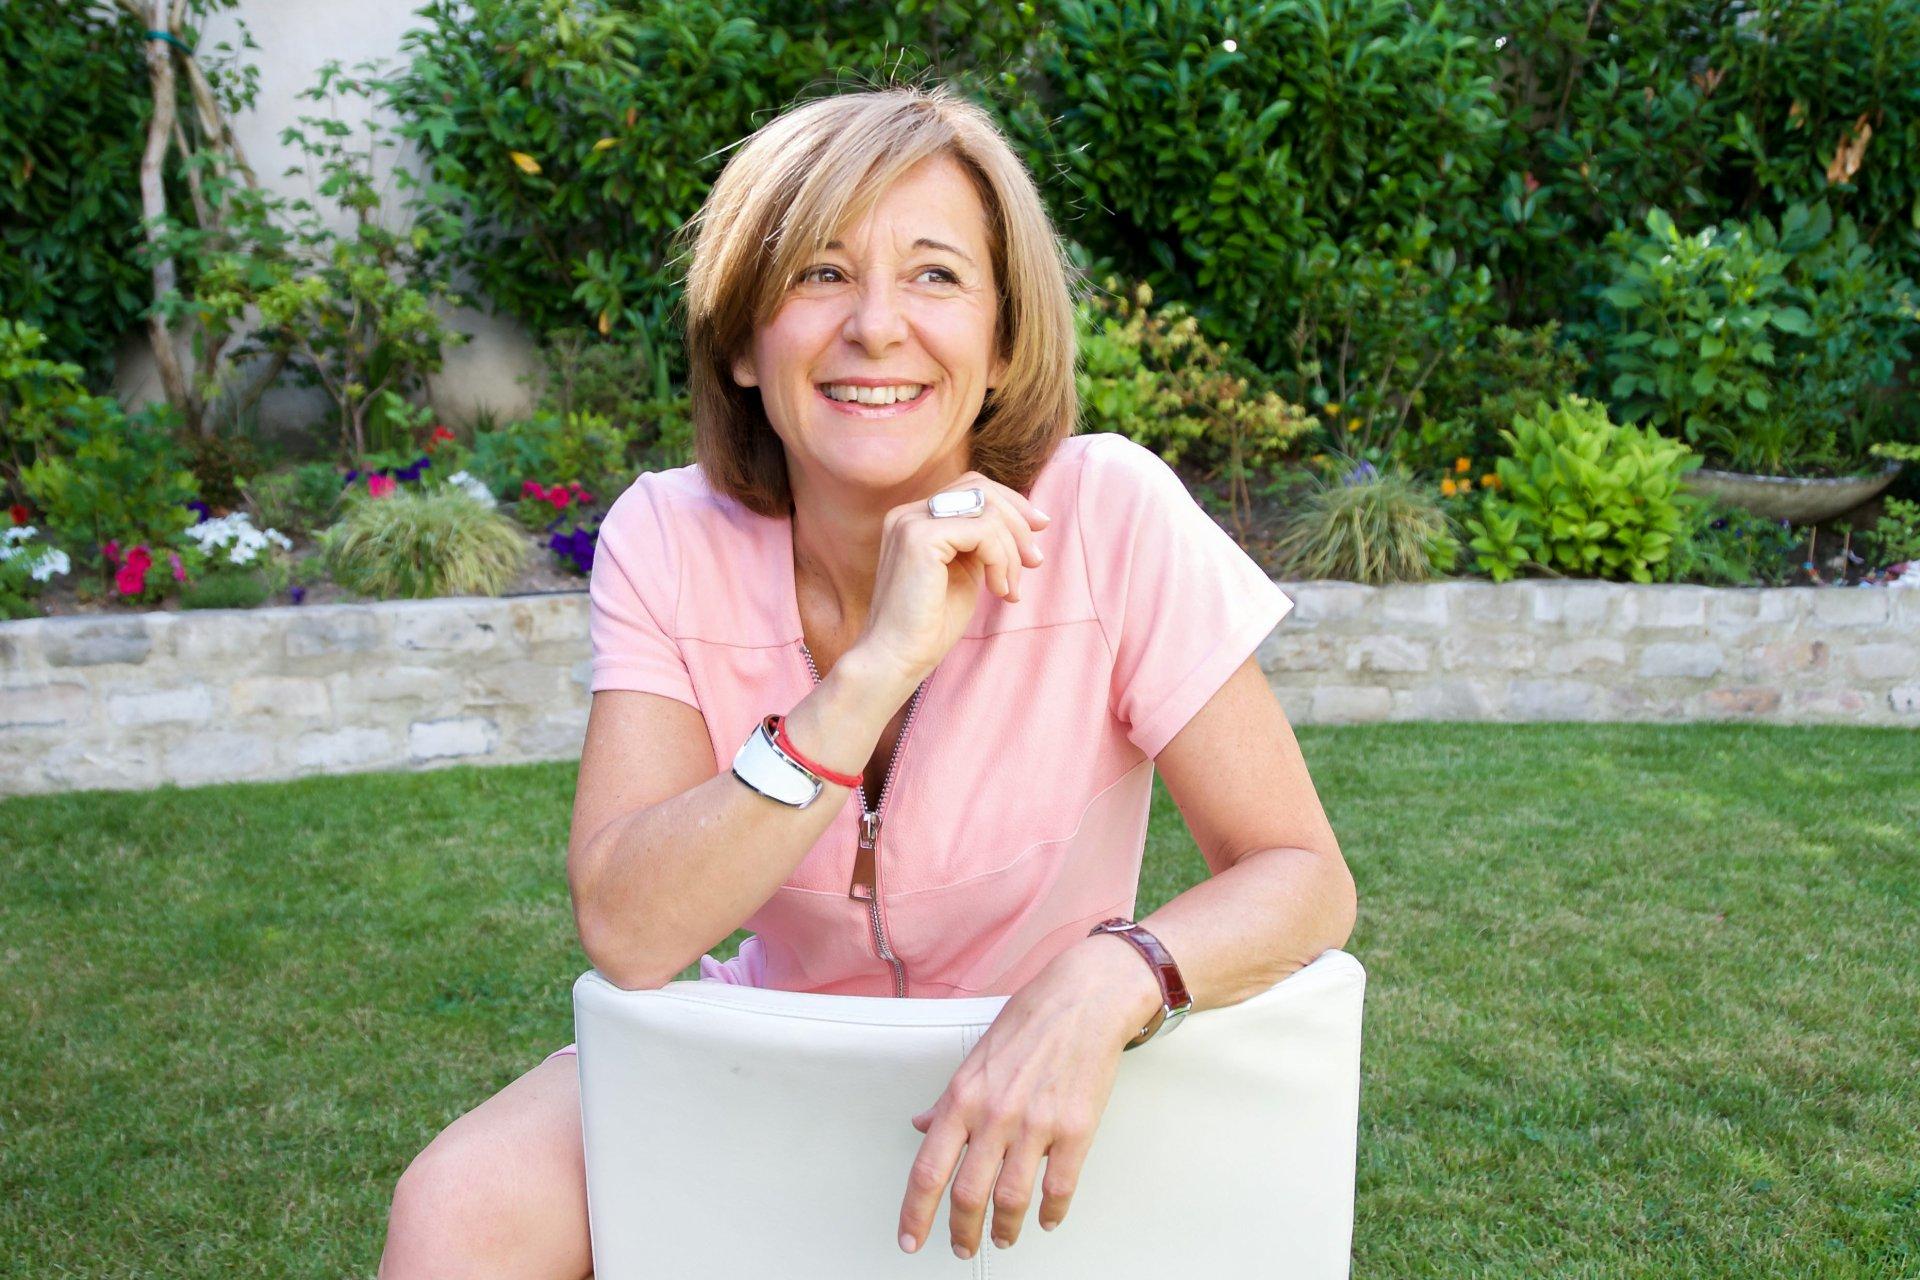 Anne-Laure Masquelier